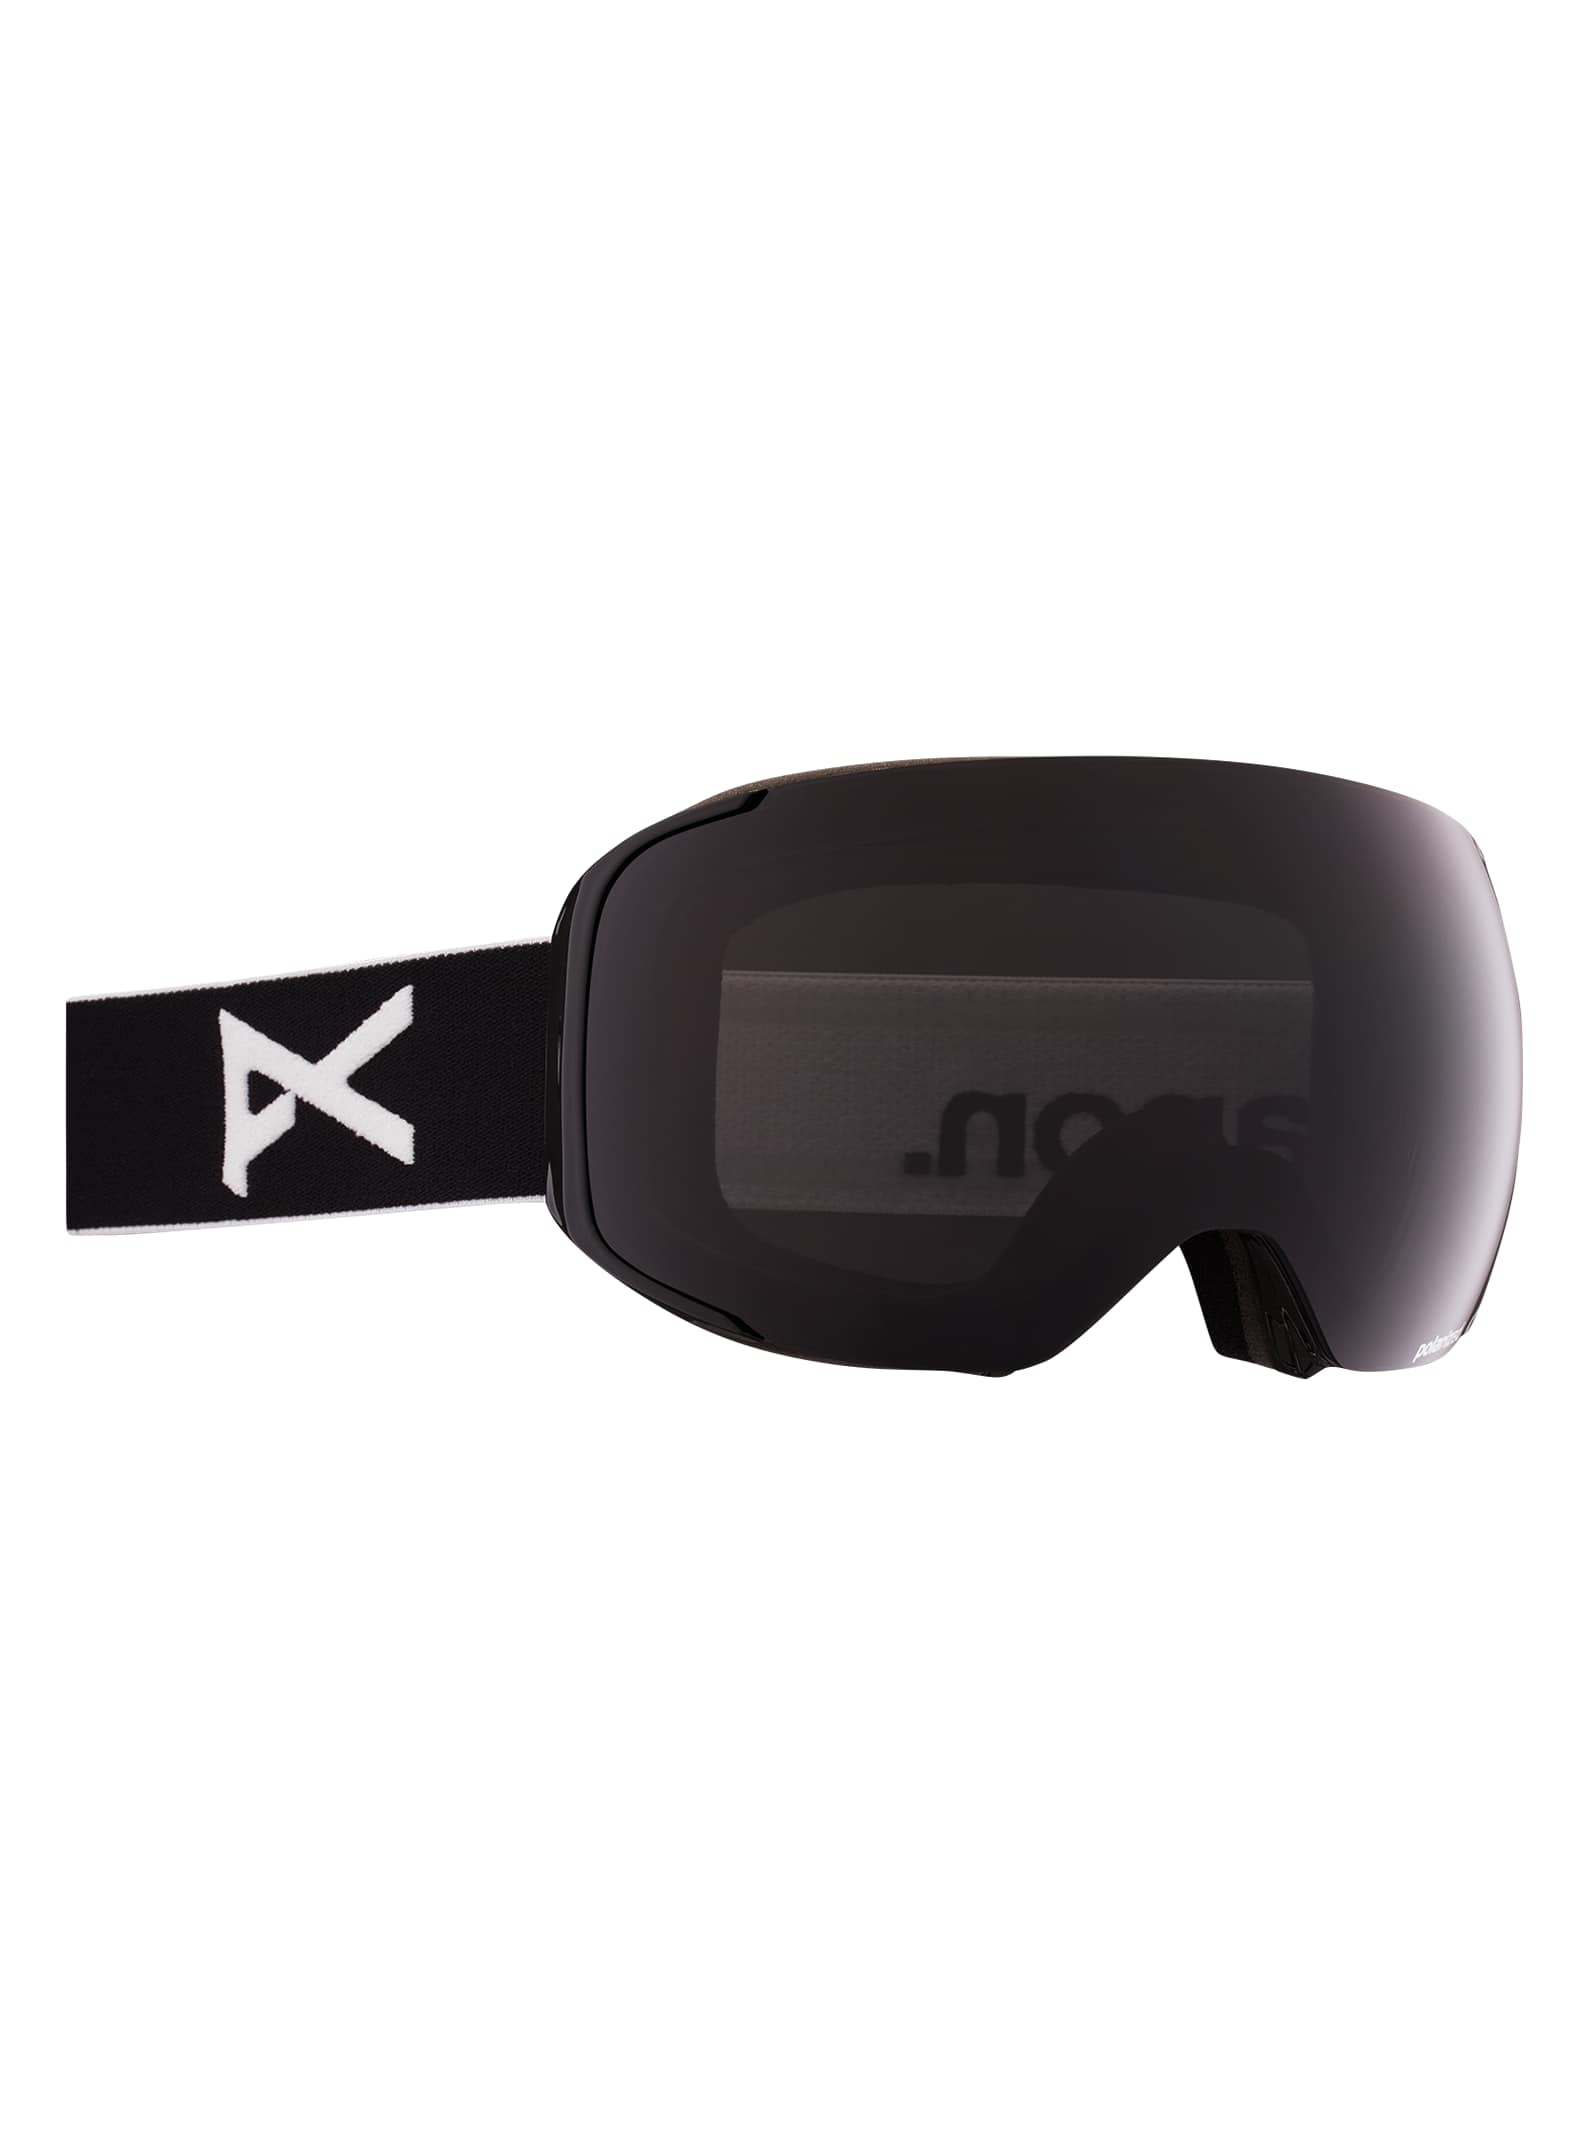 Anon M2 polariserade skidglasögon + reservlins, Frame: Black, Lens: Polar Smoke, Spare Lens: Blue Lagoon